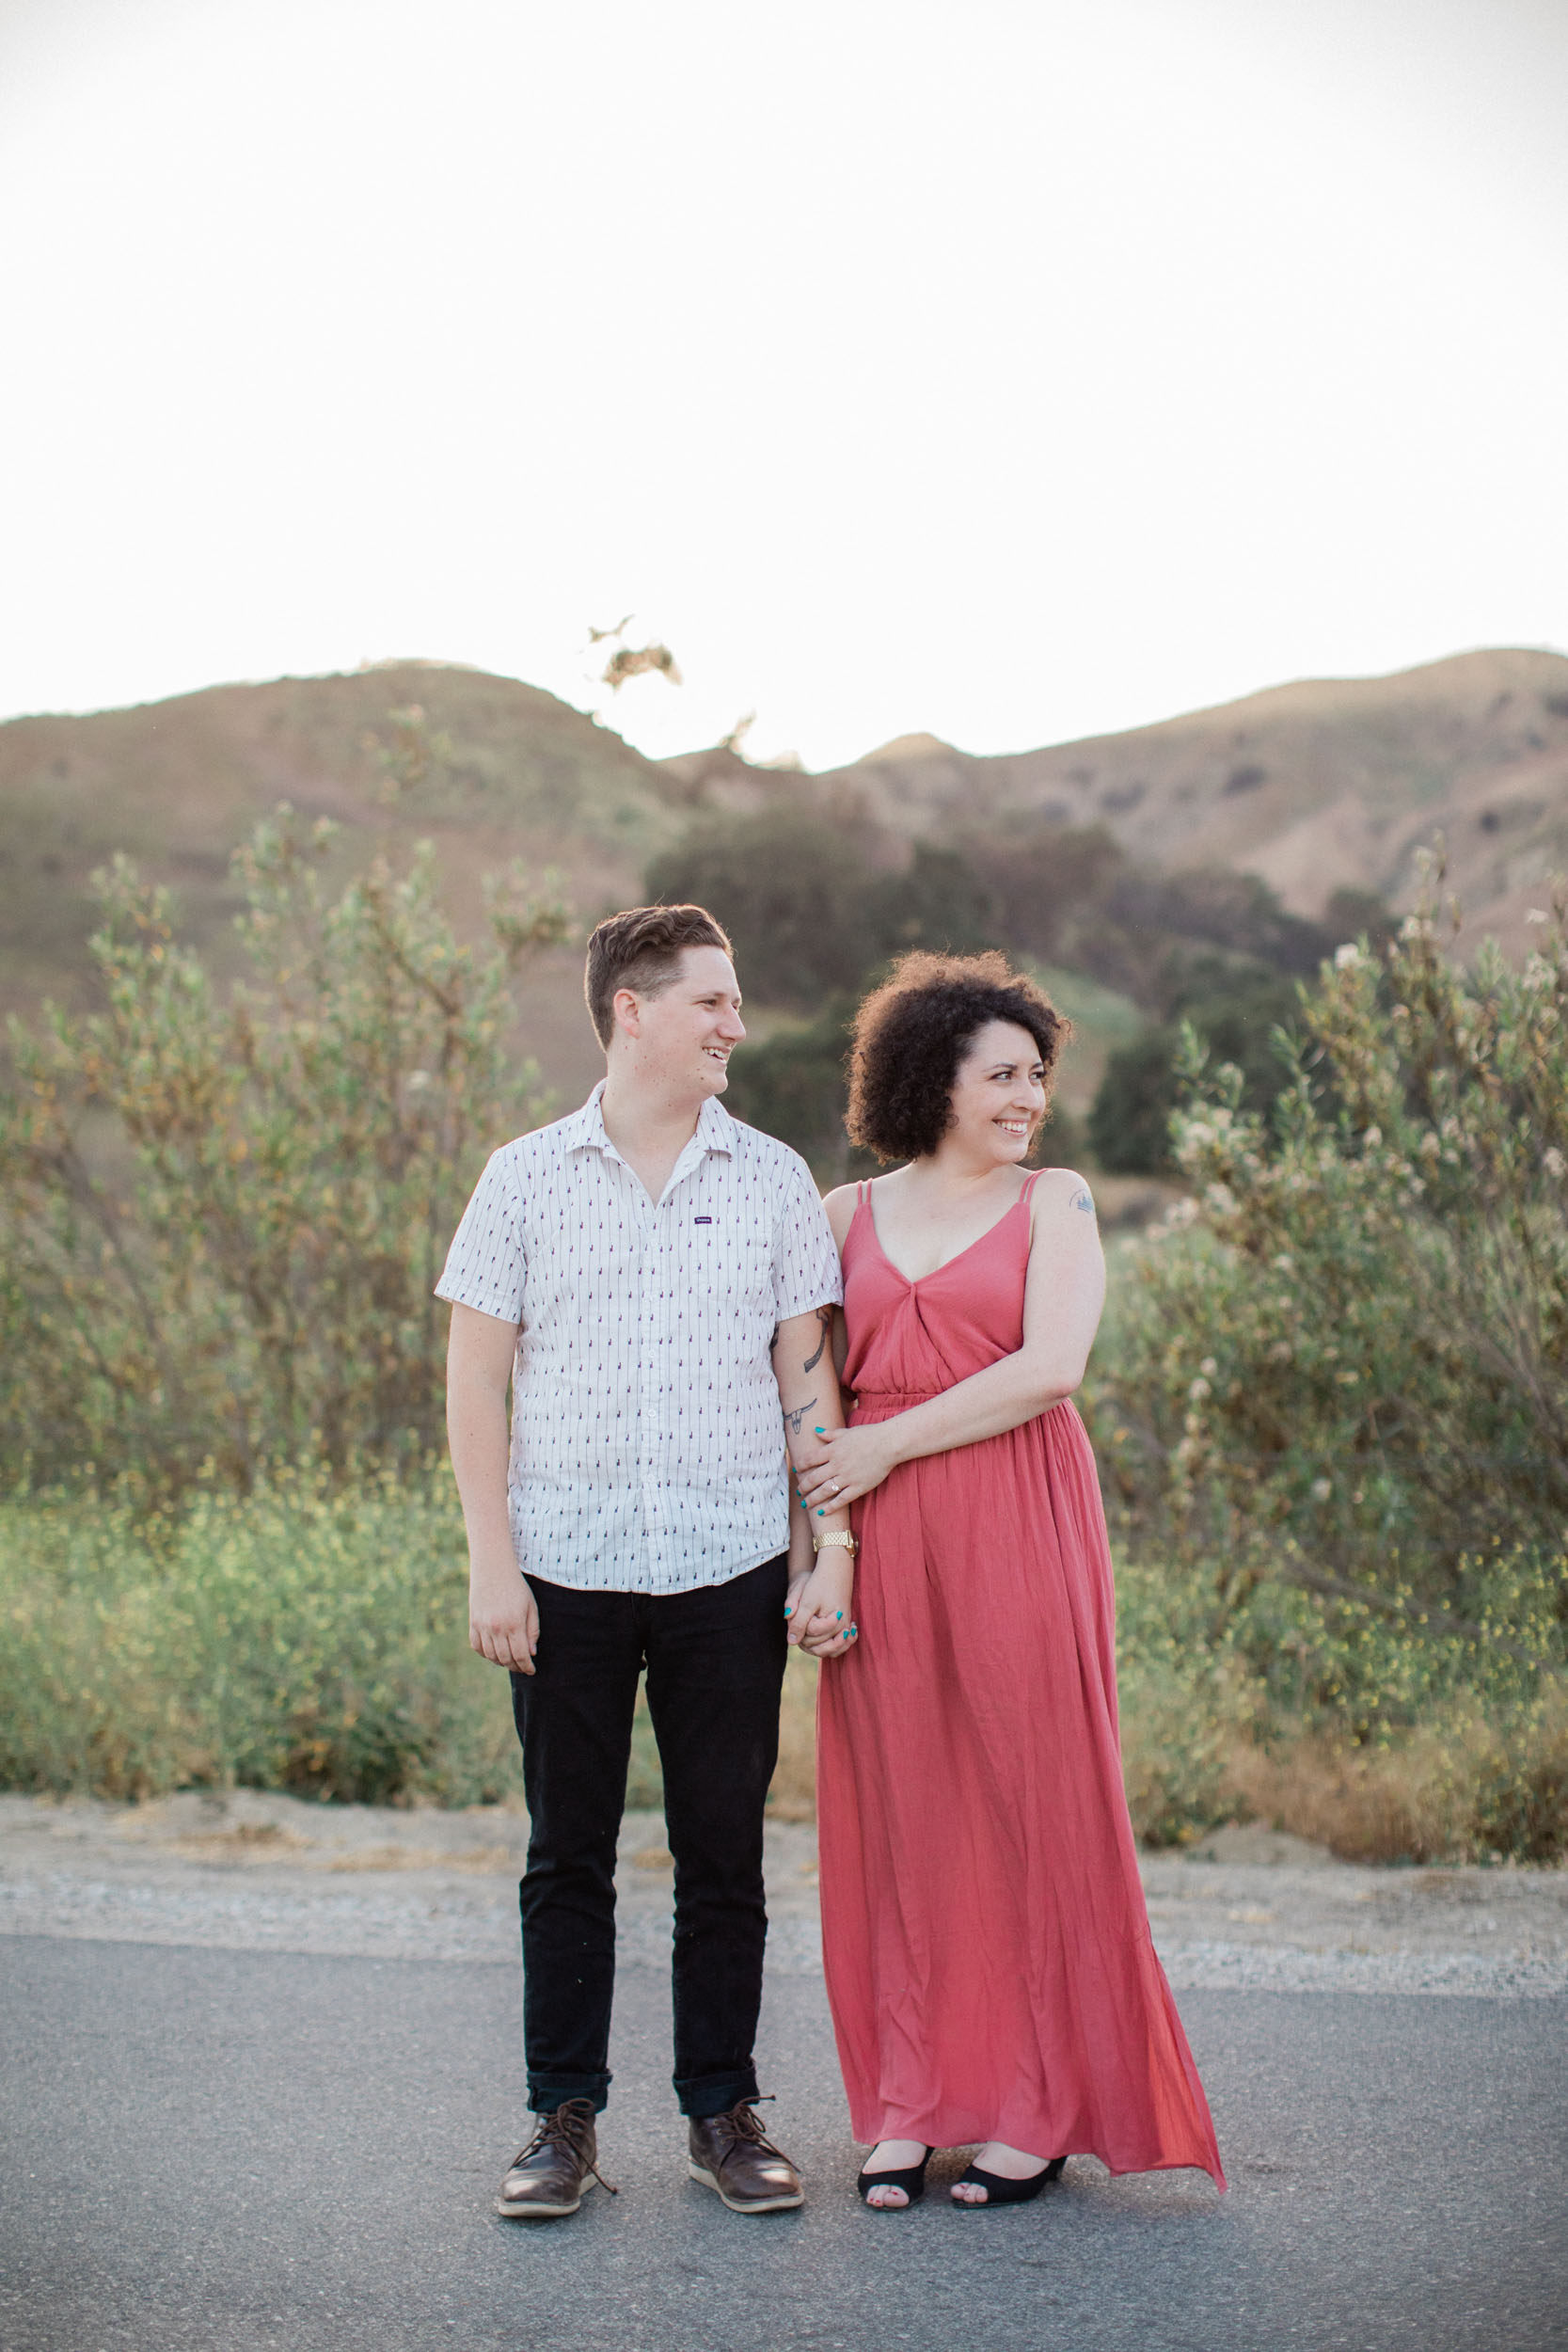 BKM-Photography-Ventura-Southern-California-Engagement-Wedding-0045.jpg